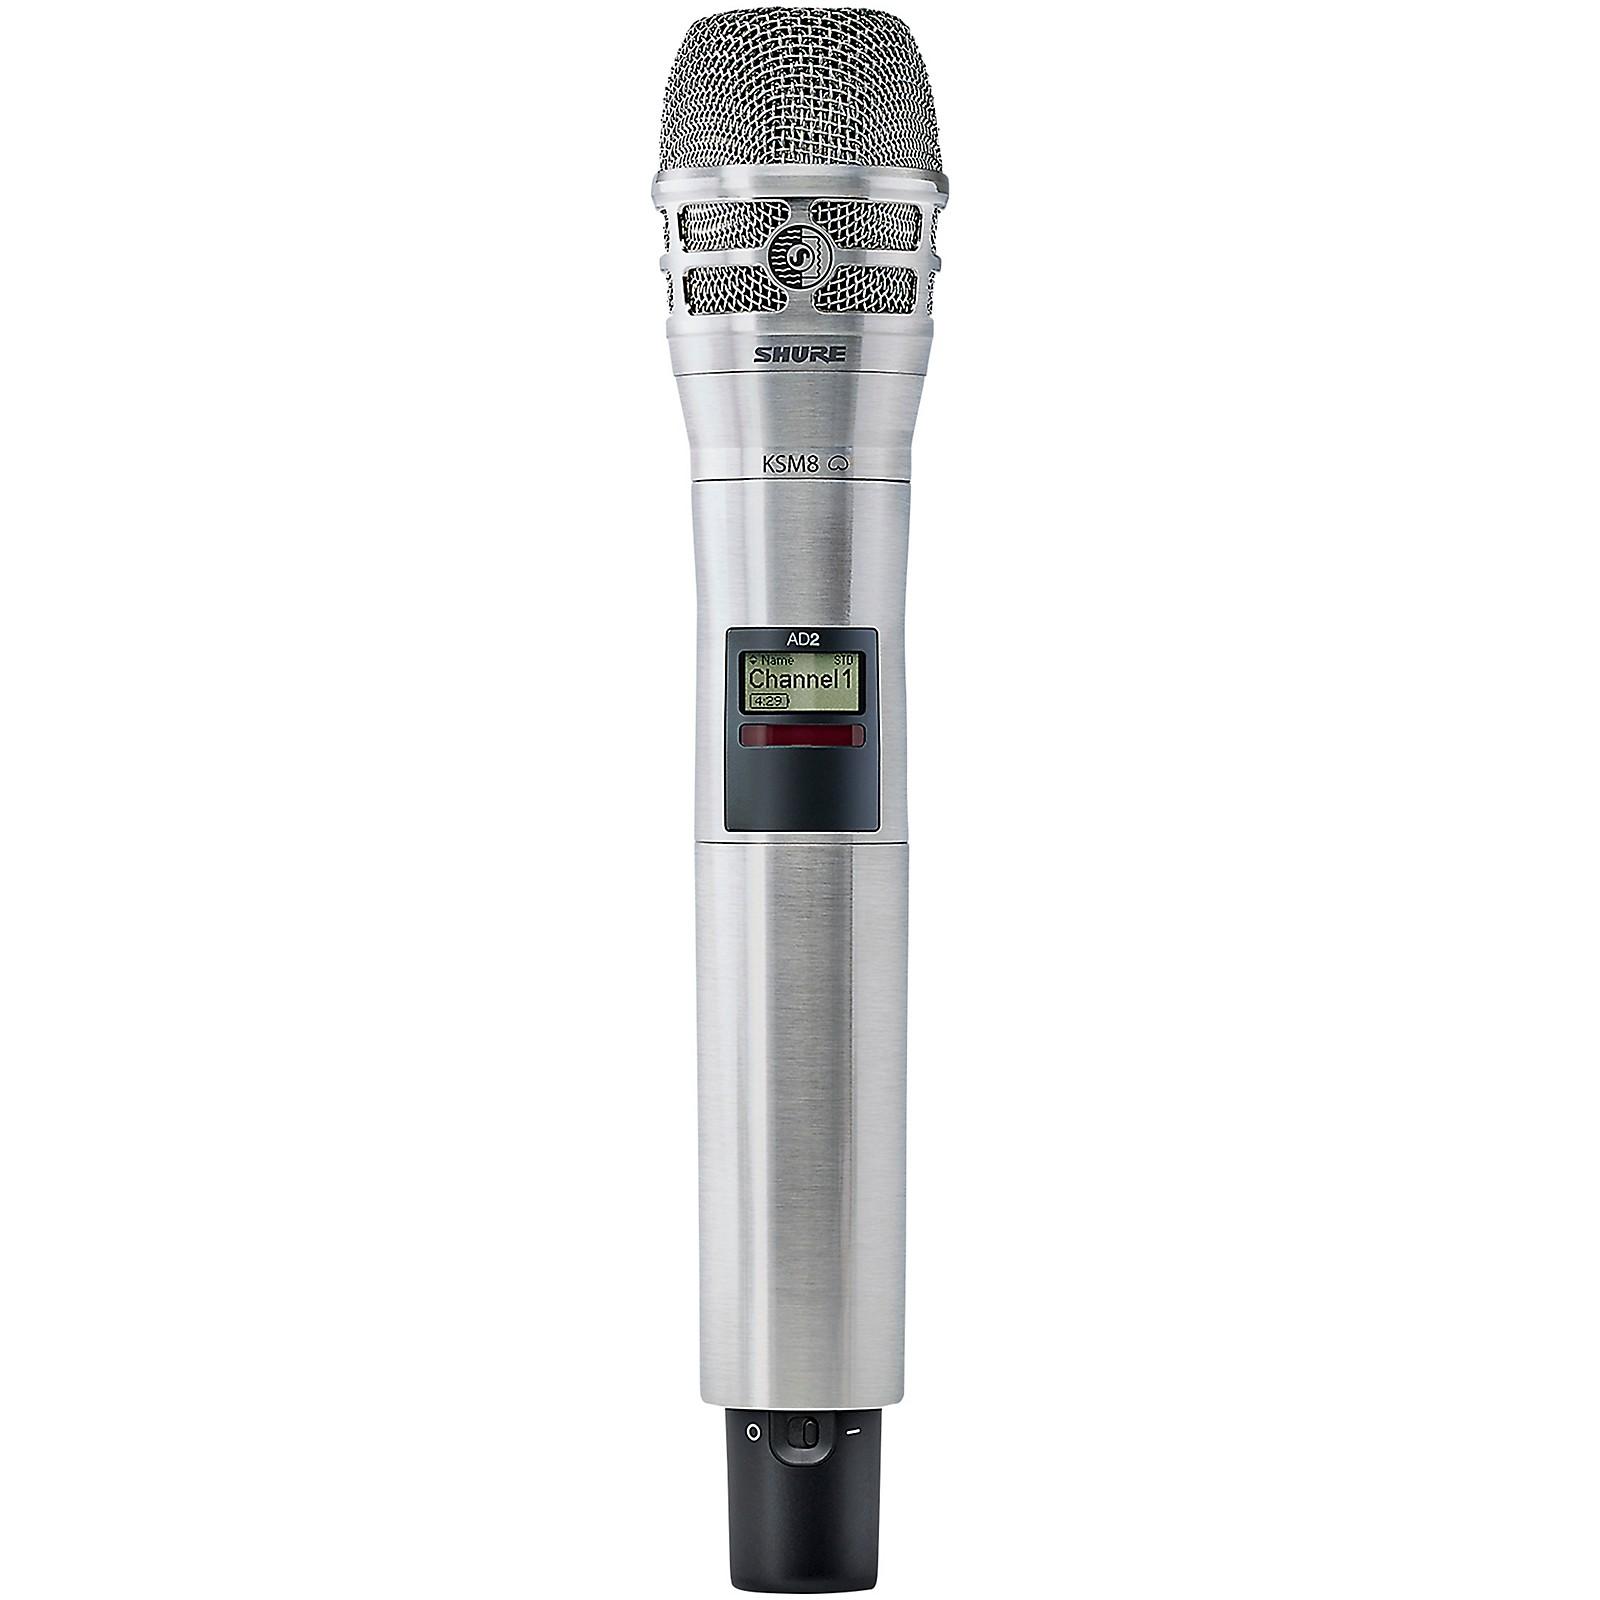 Open Box Shure Axient Digital AD2/K8N Handheld Wireless Transmitter with Nickel KSM8 Microphone